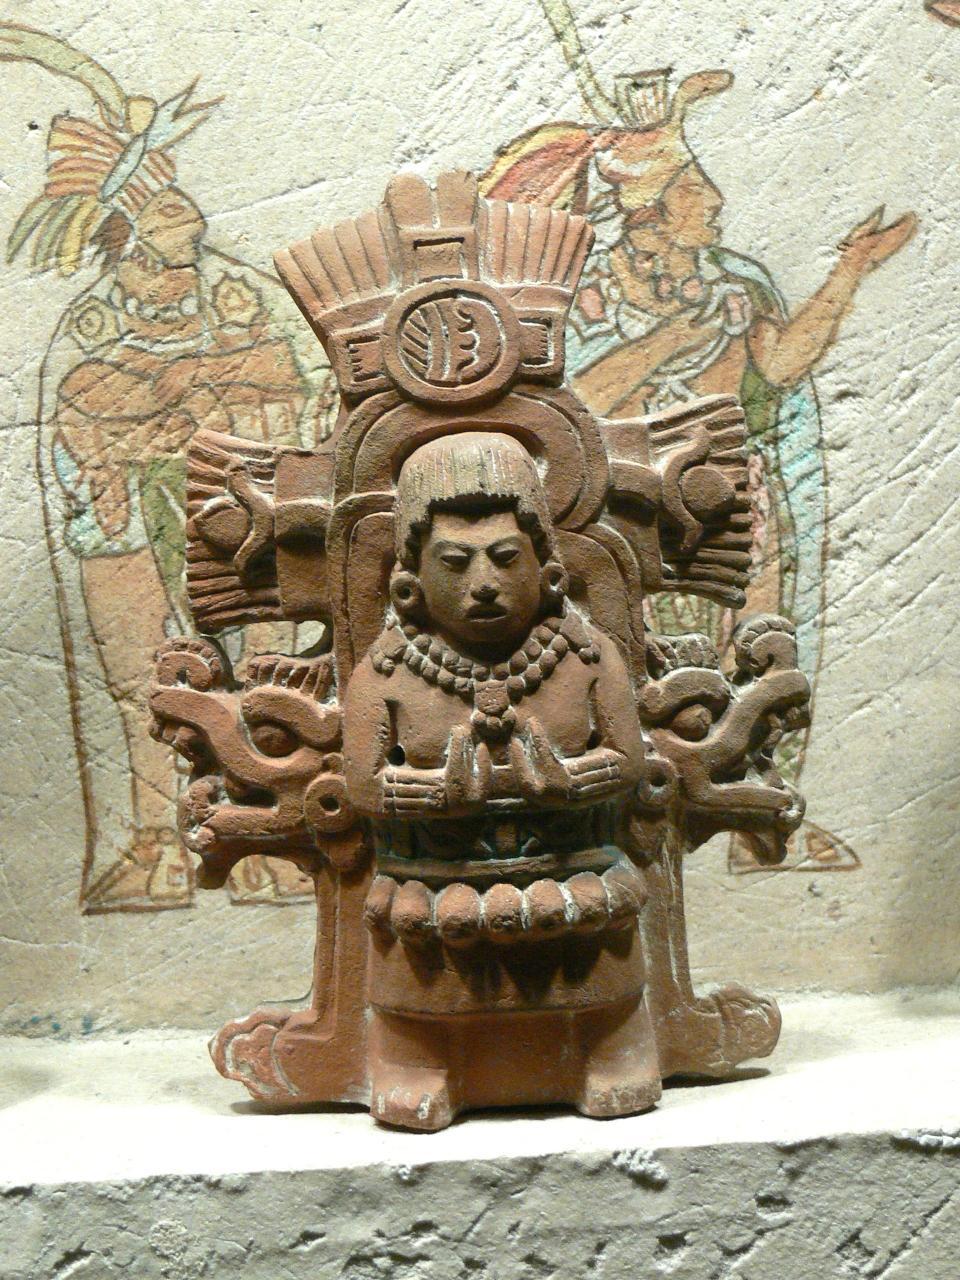 https://upload.wikimedia.org/wikipedia/commons/b/b7/Maya_Priester.jpg